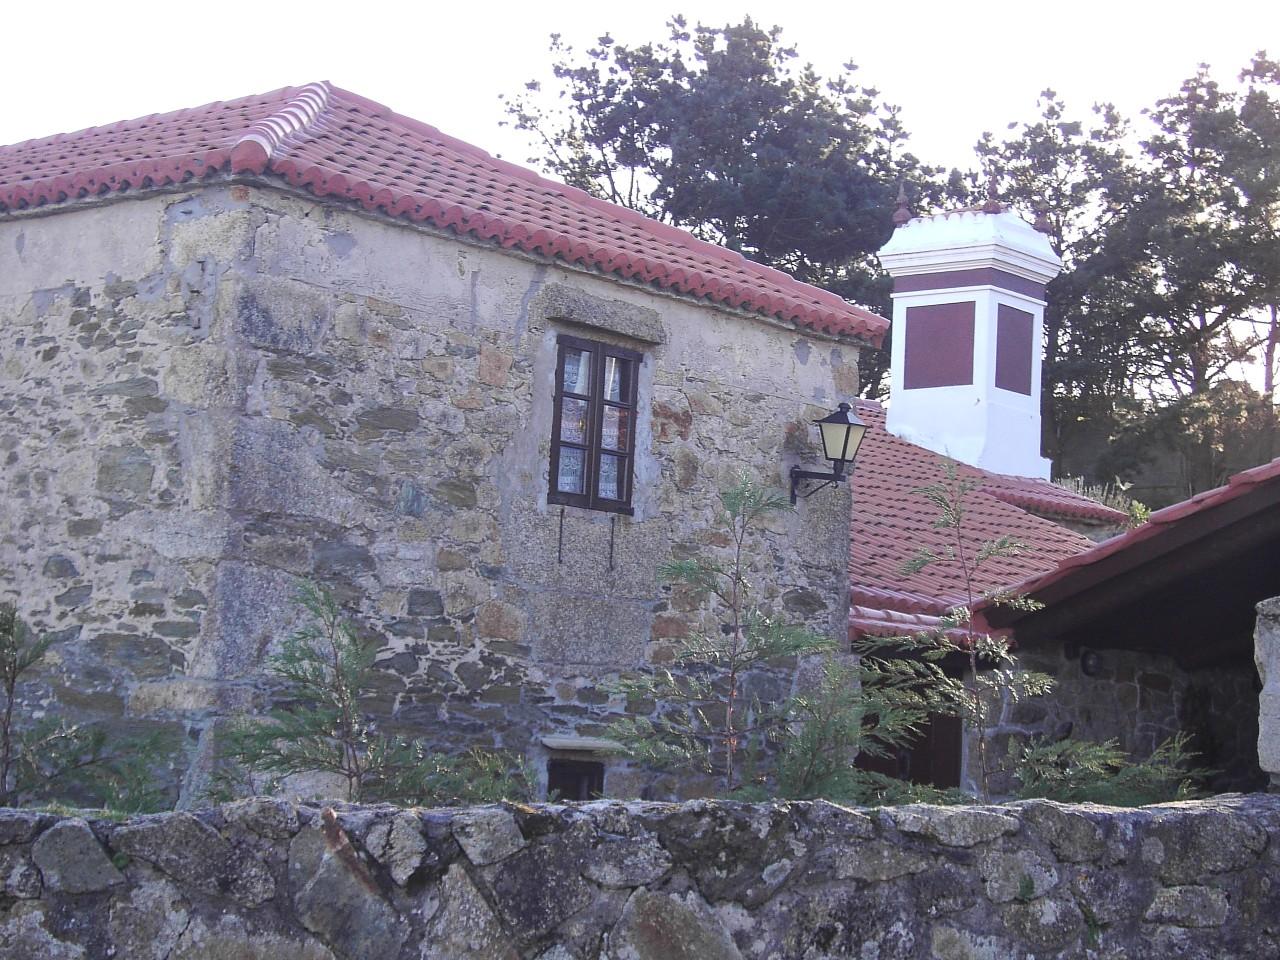 Covas  - Vivenda restaurada